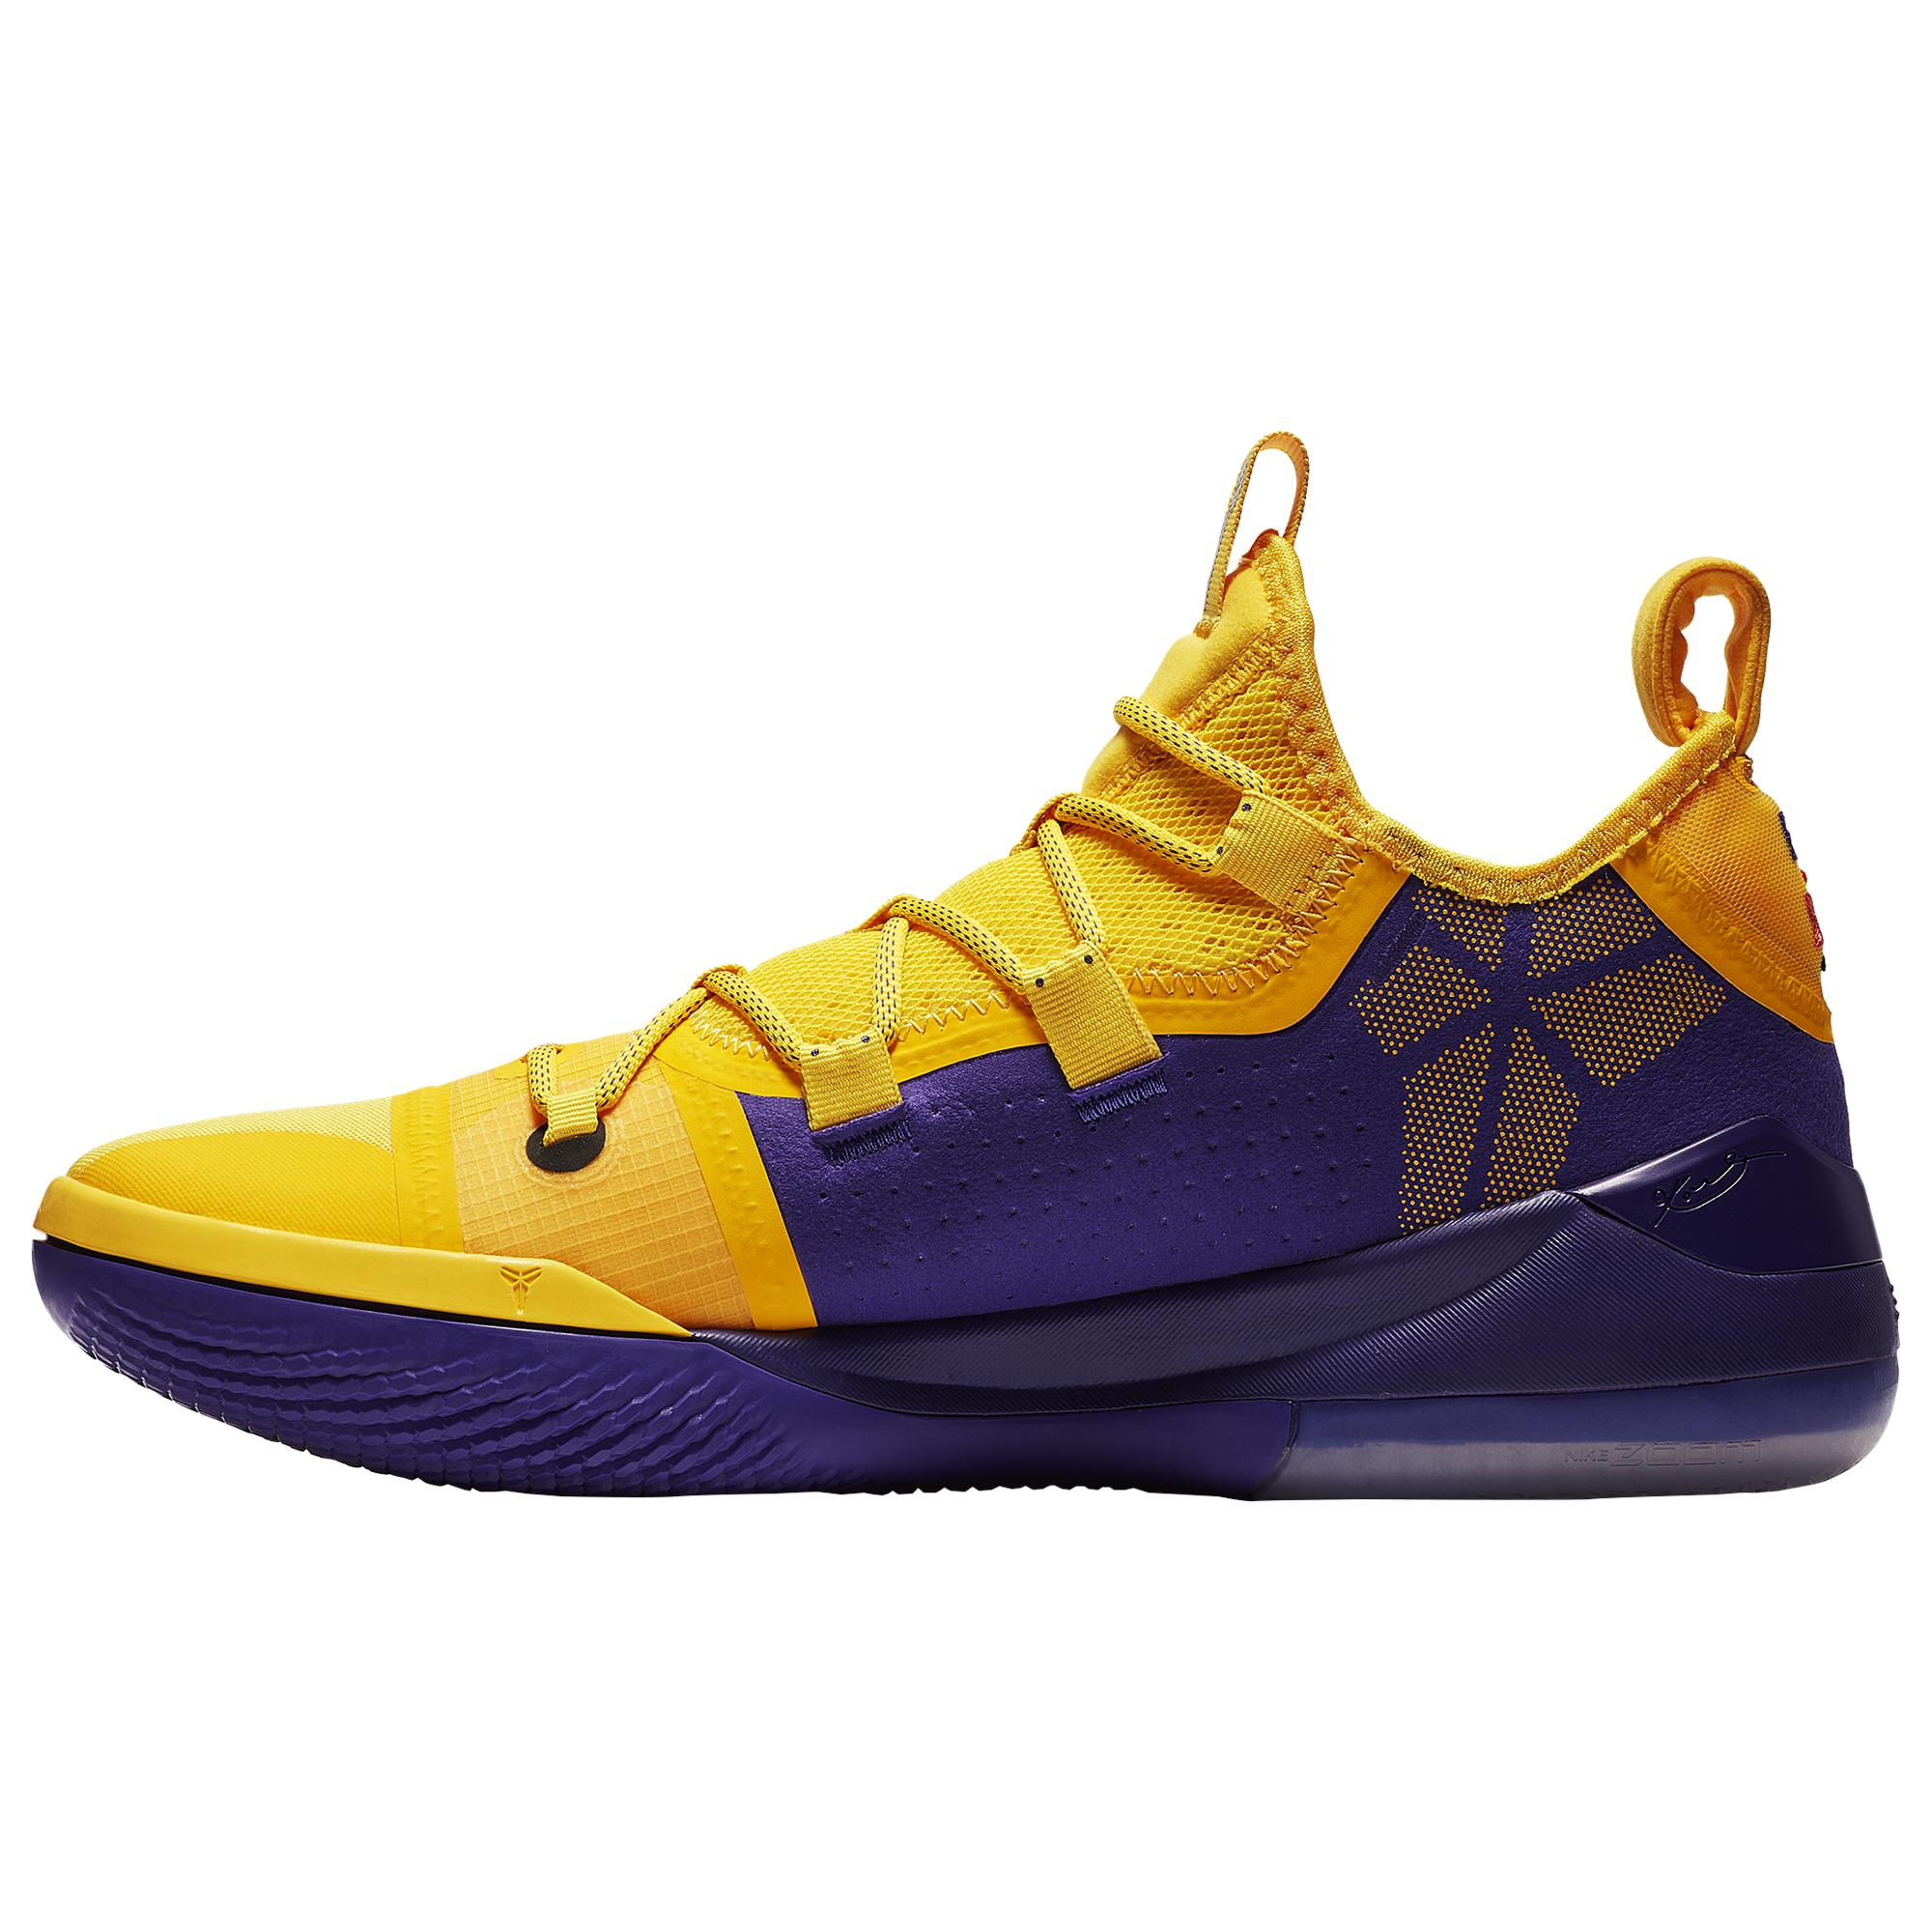 Nike Rubber Kobe Ad Lakers Amarillo in